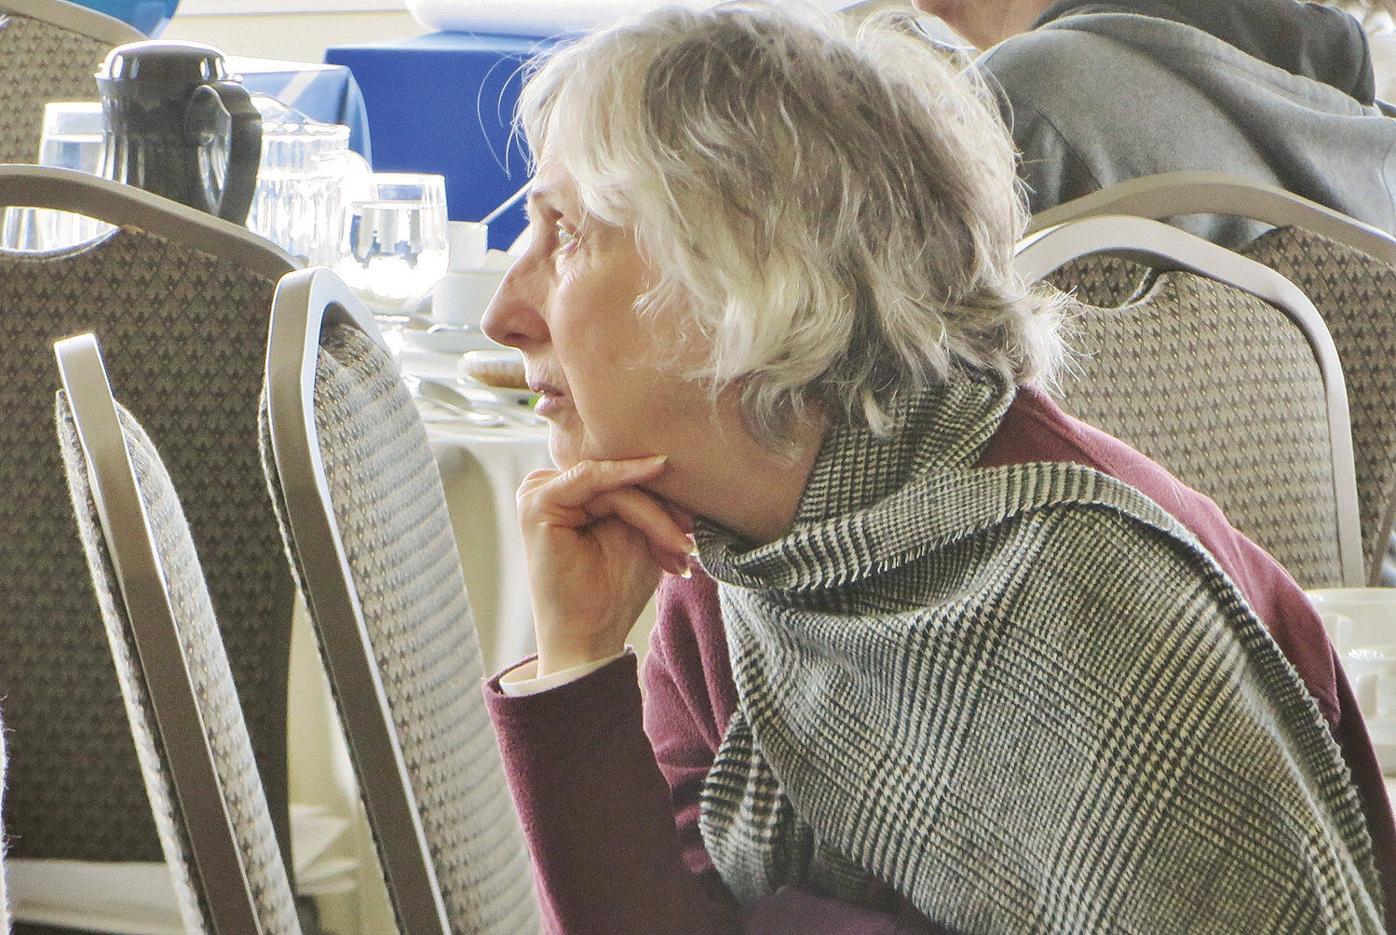 Berkshire SuperGenarian forum seeks to break barriers to aging healthily